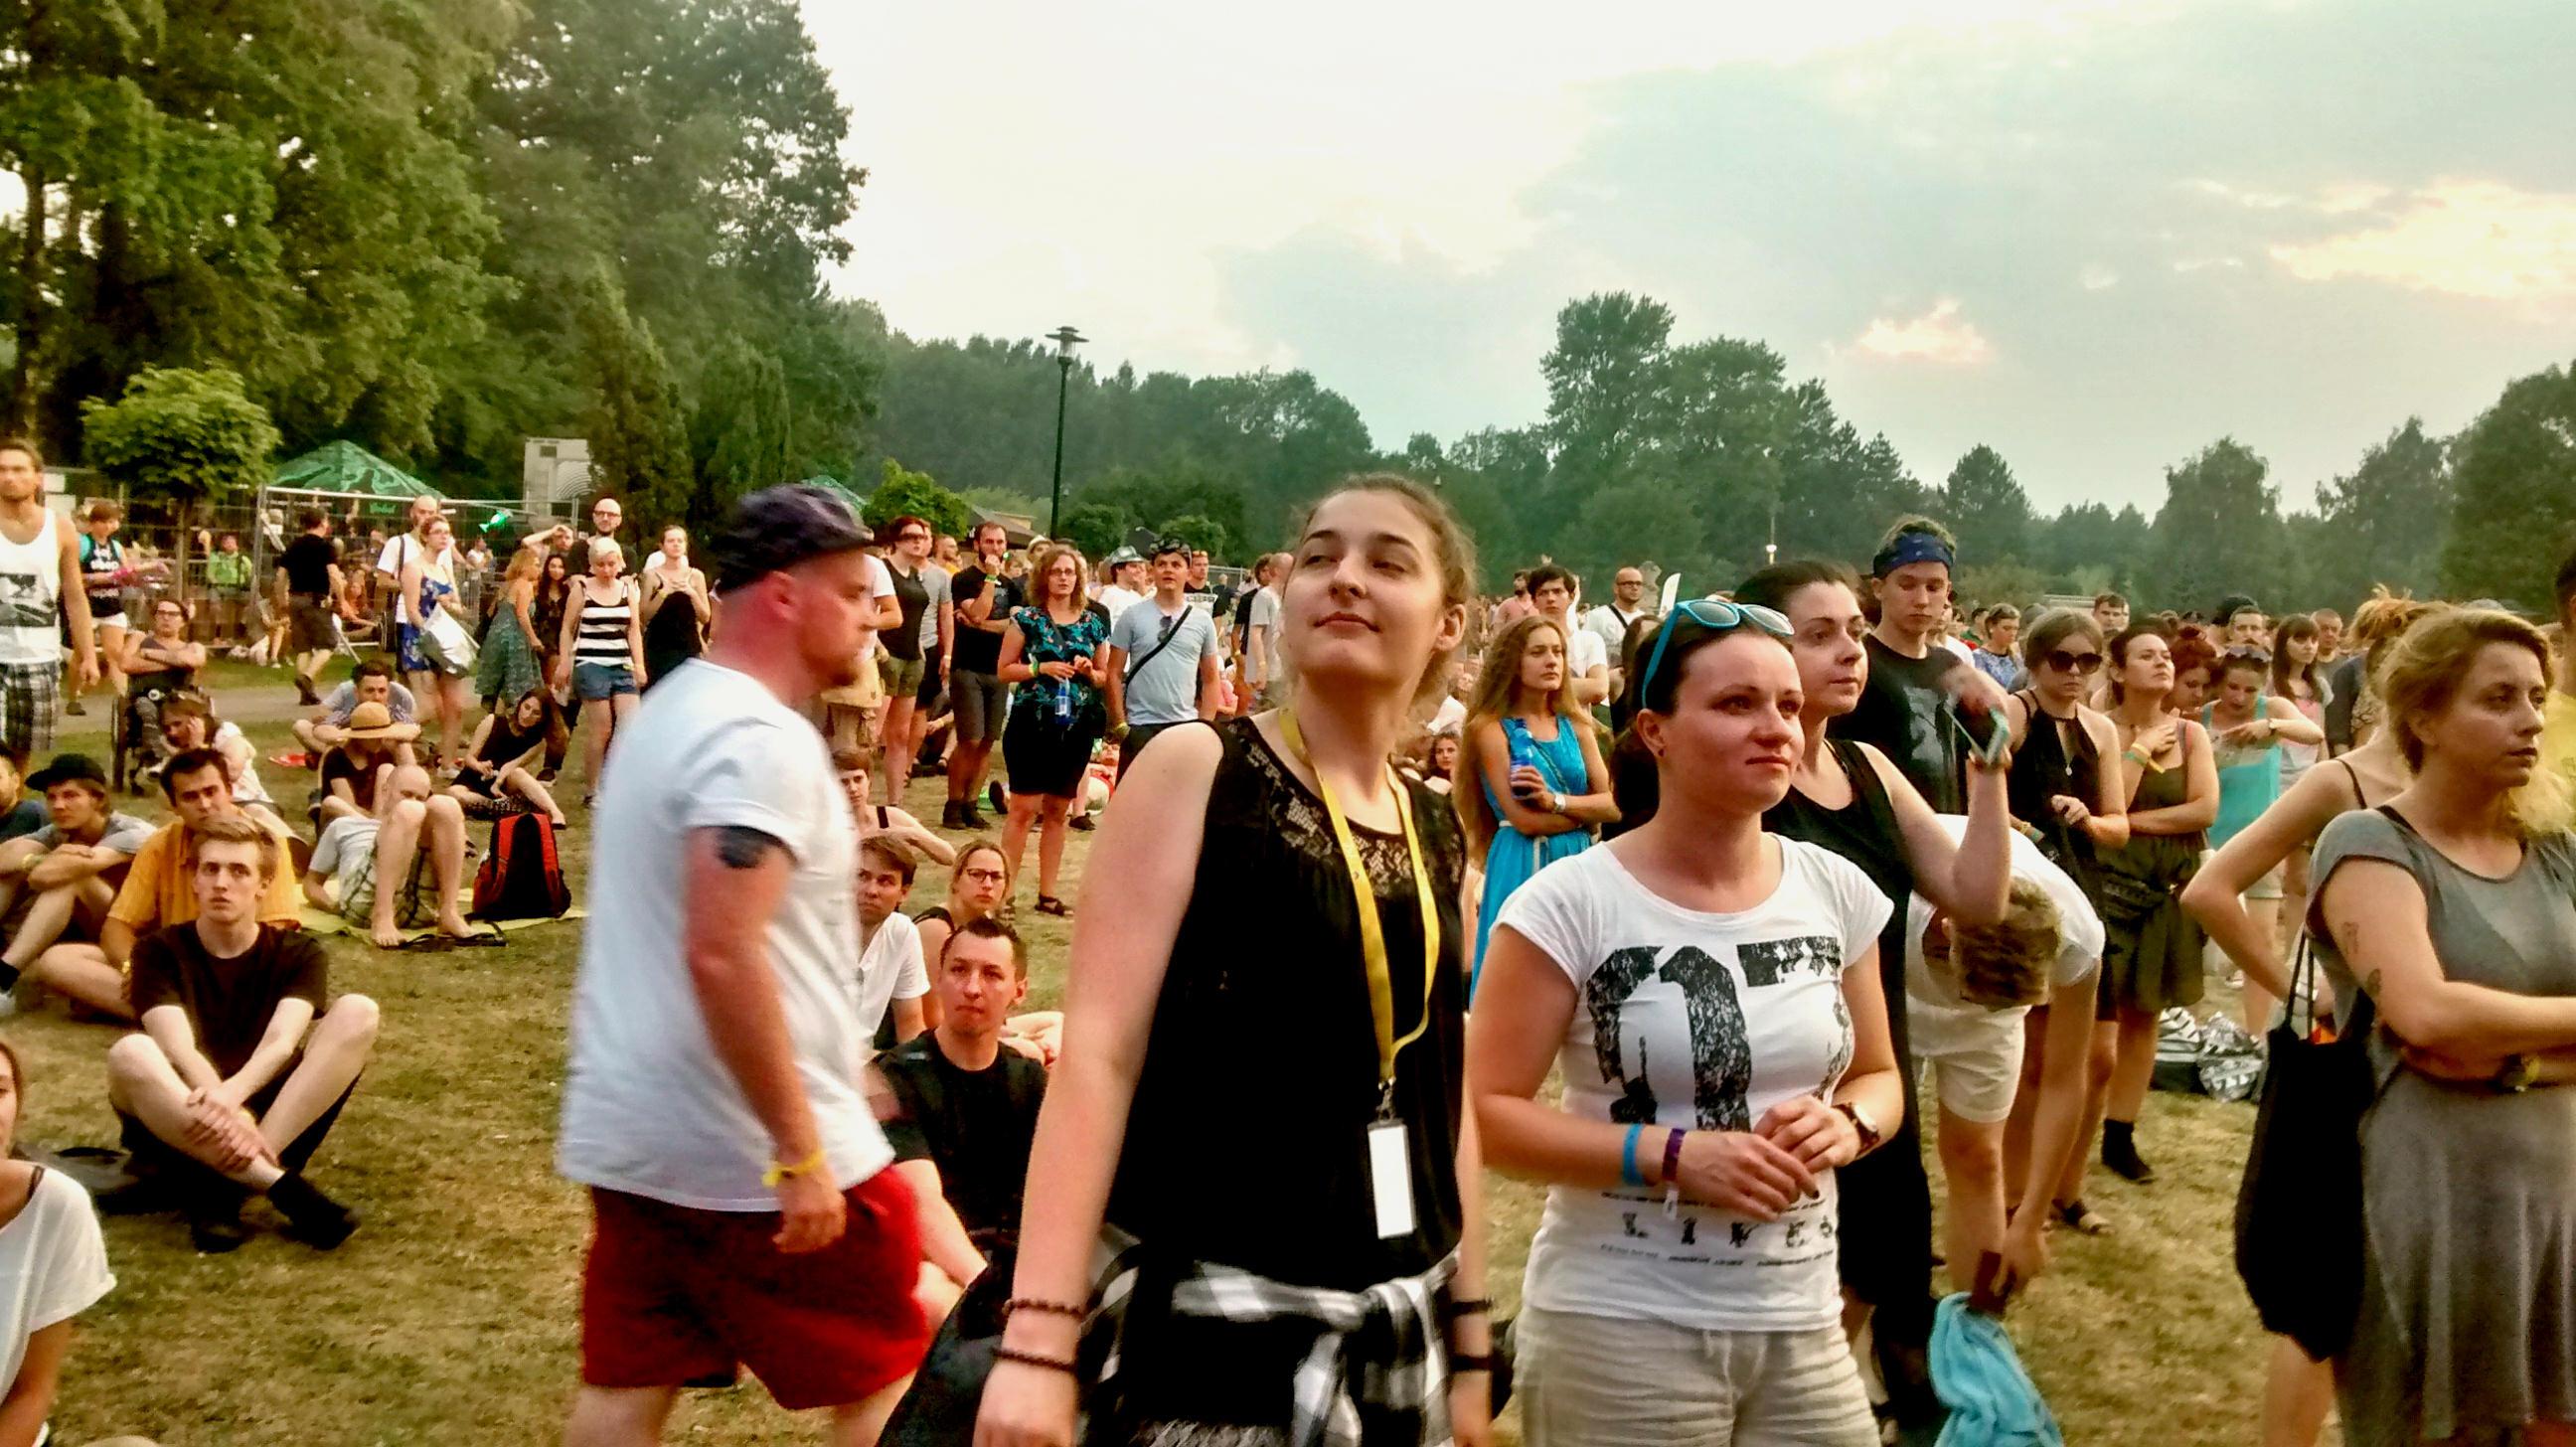 OFF Festival 2015 (fot. Sara Marondel)